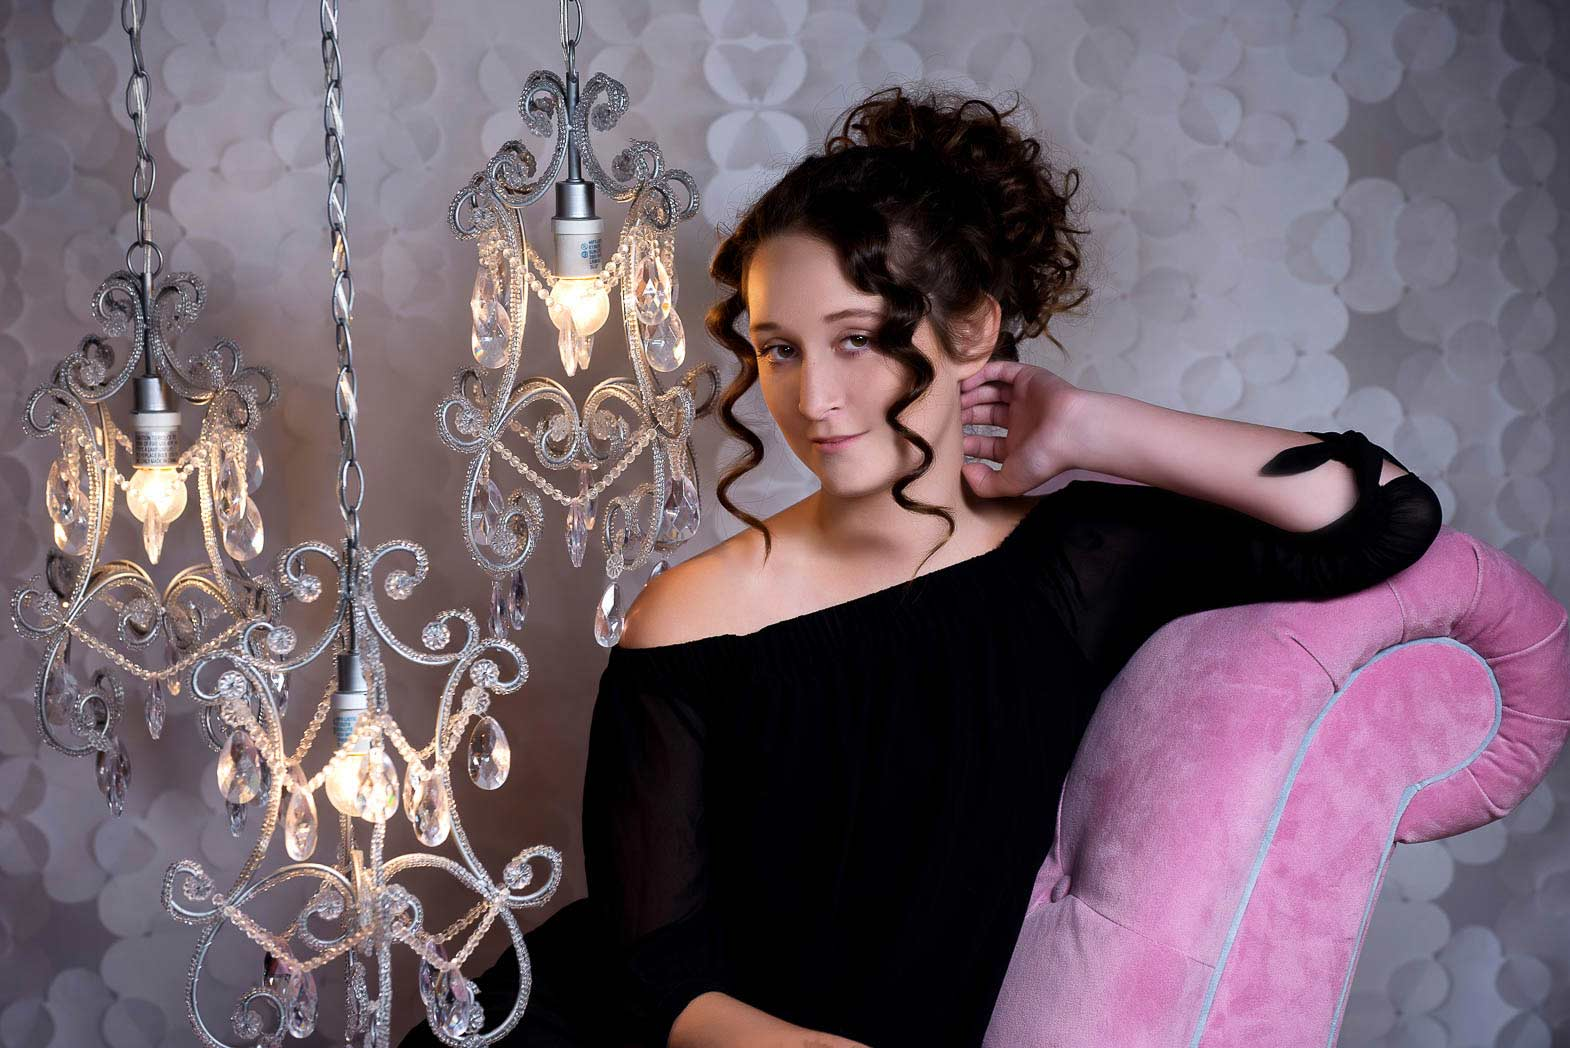 senior girl sitting by chandeleirs on pink sofa